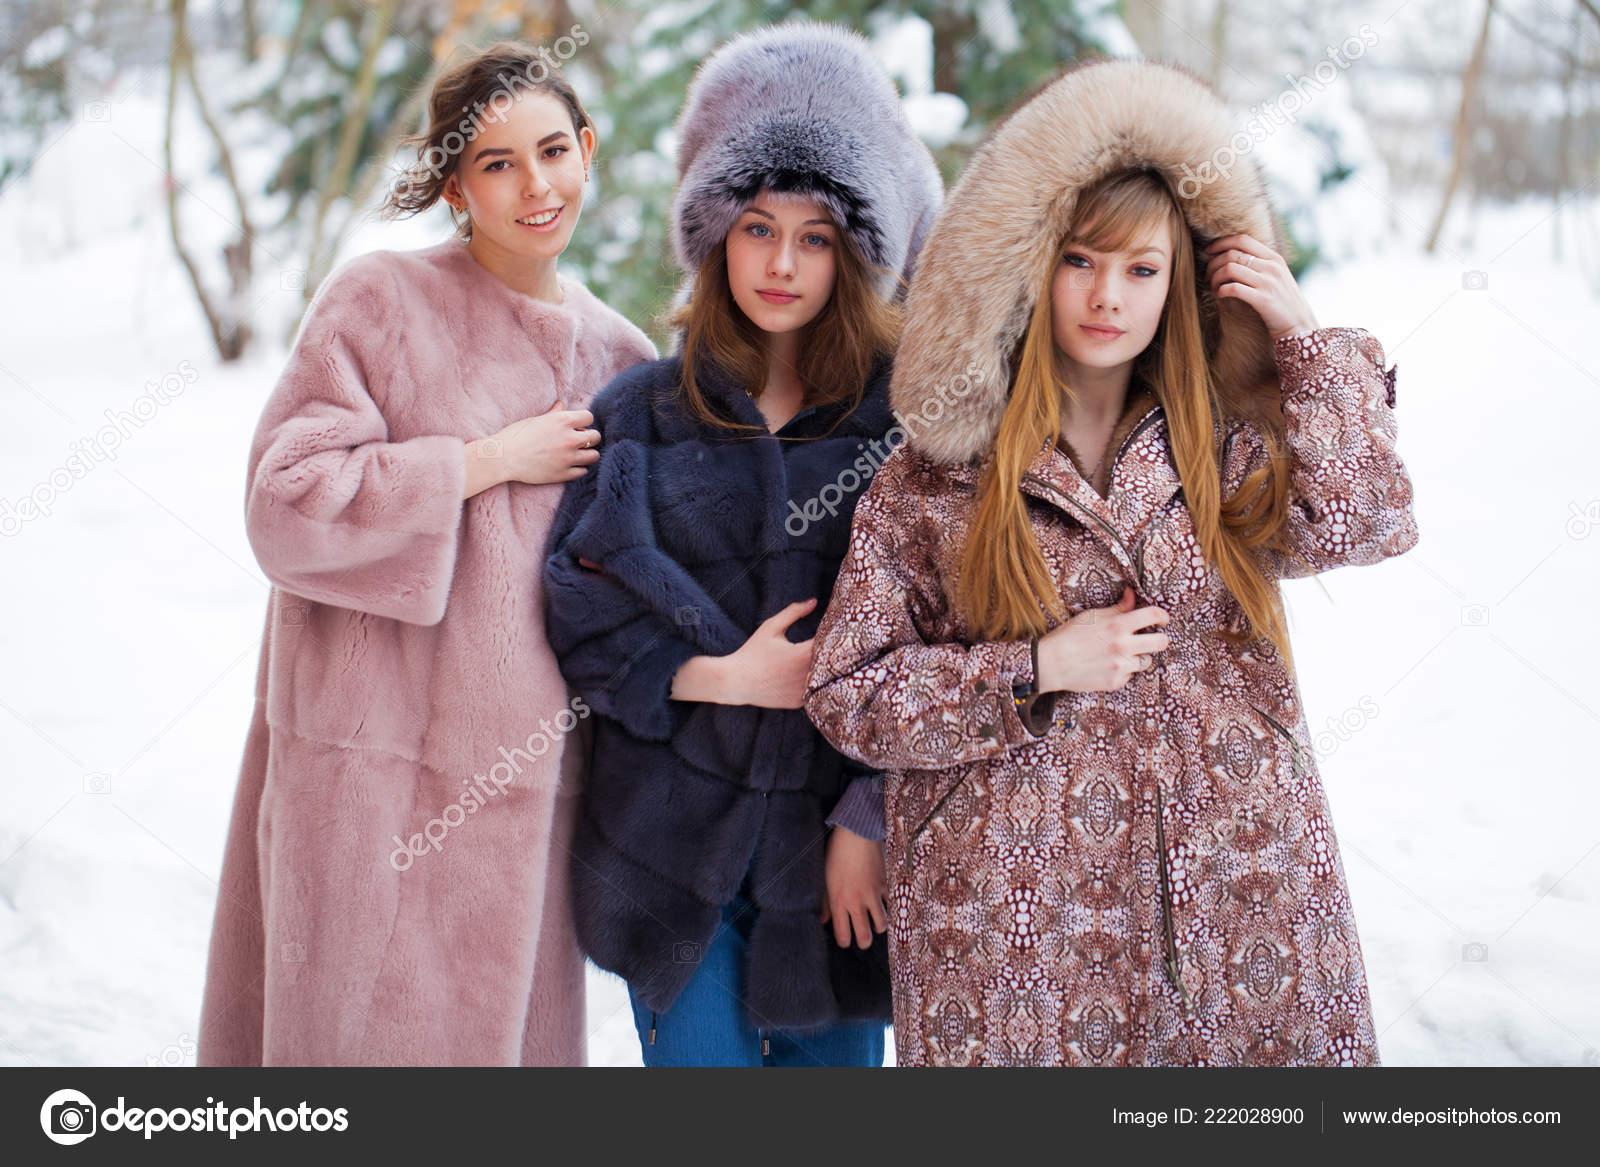 fae957b09a8c Τρία Μοντέλα Μόδα Στη Γούνα Ολόσωμο Πορτρέτο Του Νεαρή Όμορφη — Φωτογραφία  Αρχείου